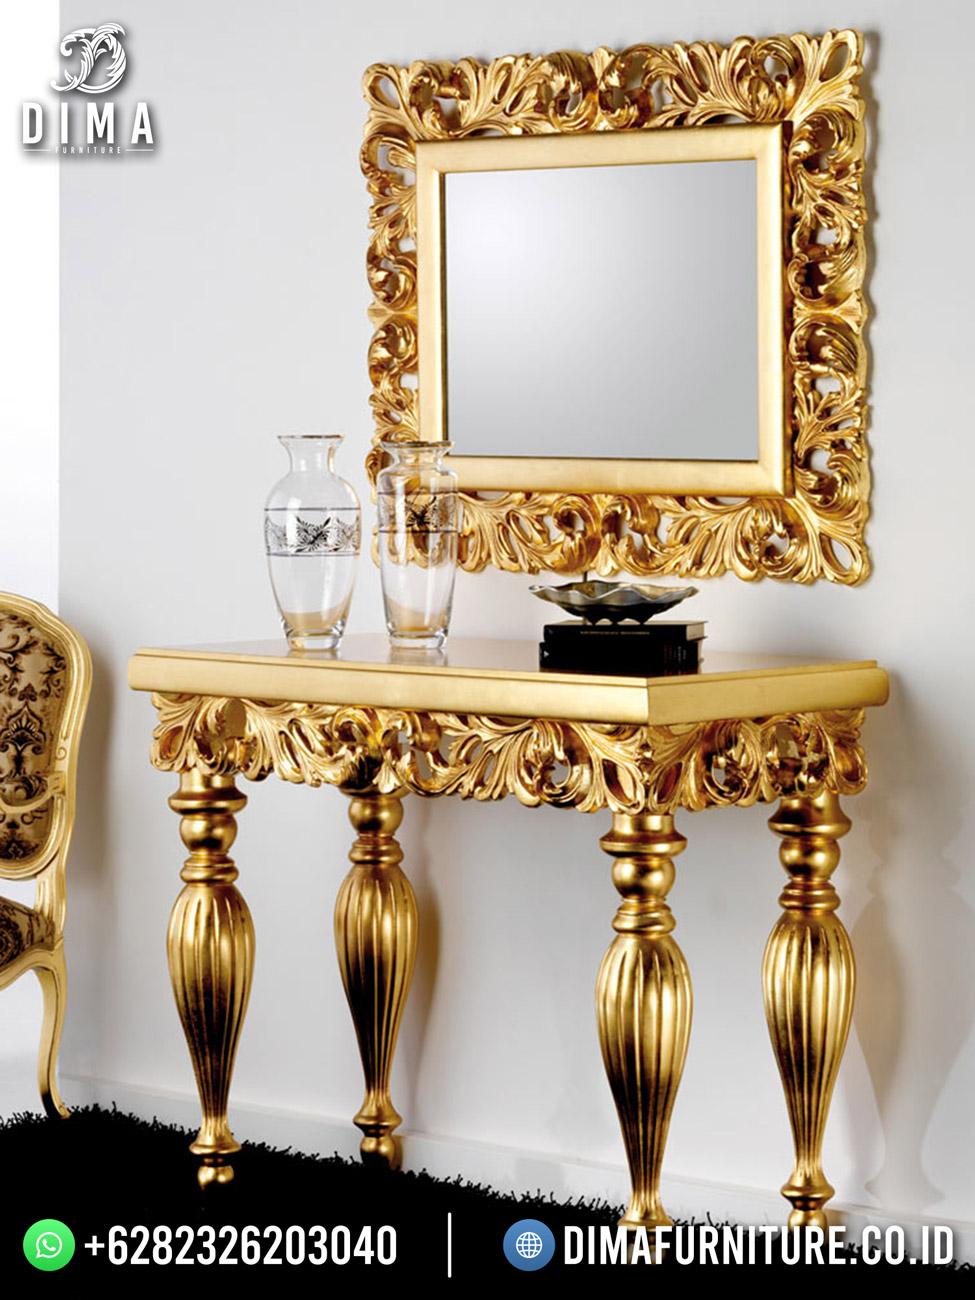 Golden Luxury Set Meja Konsol Asli Jepara DF-1656